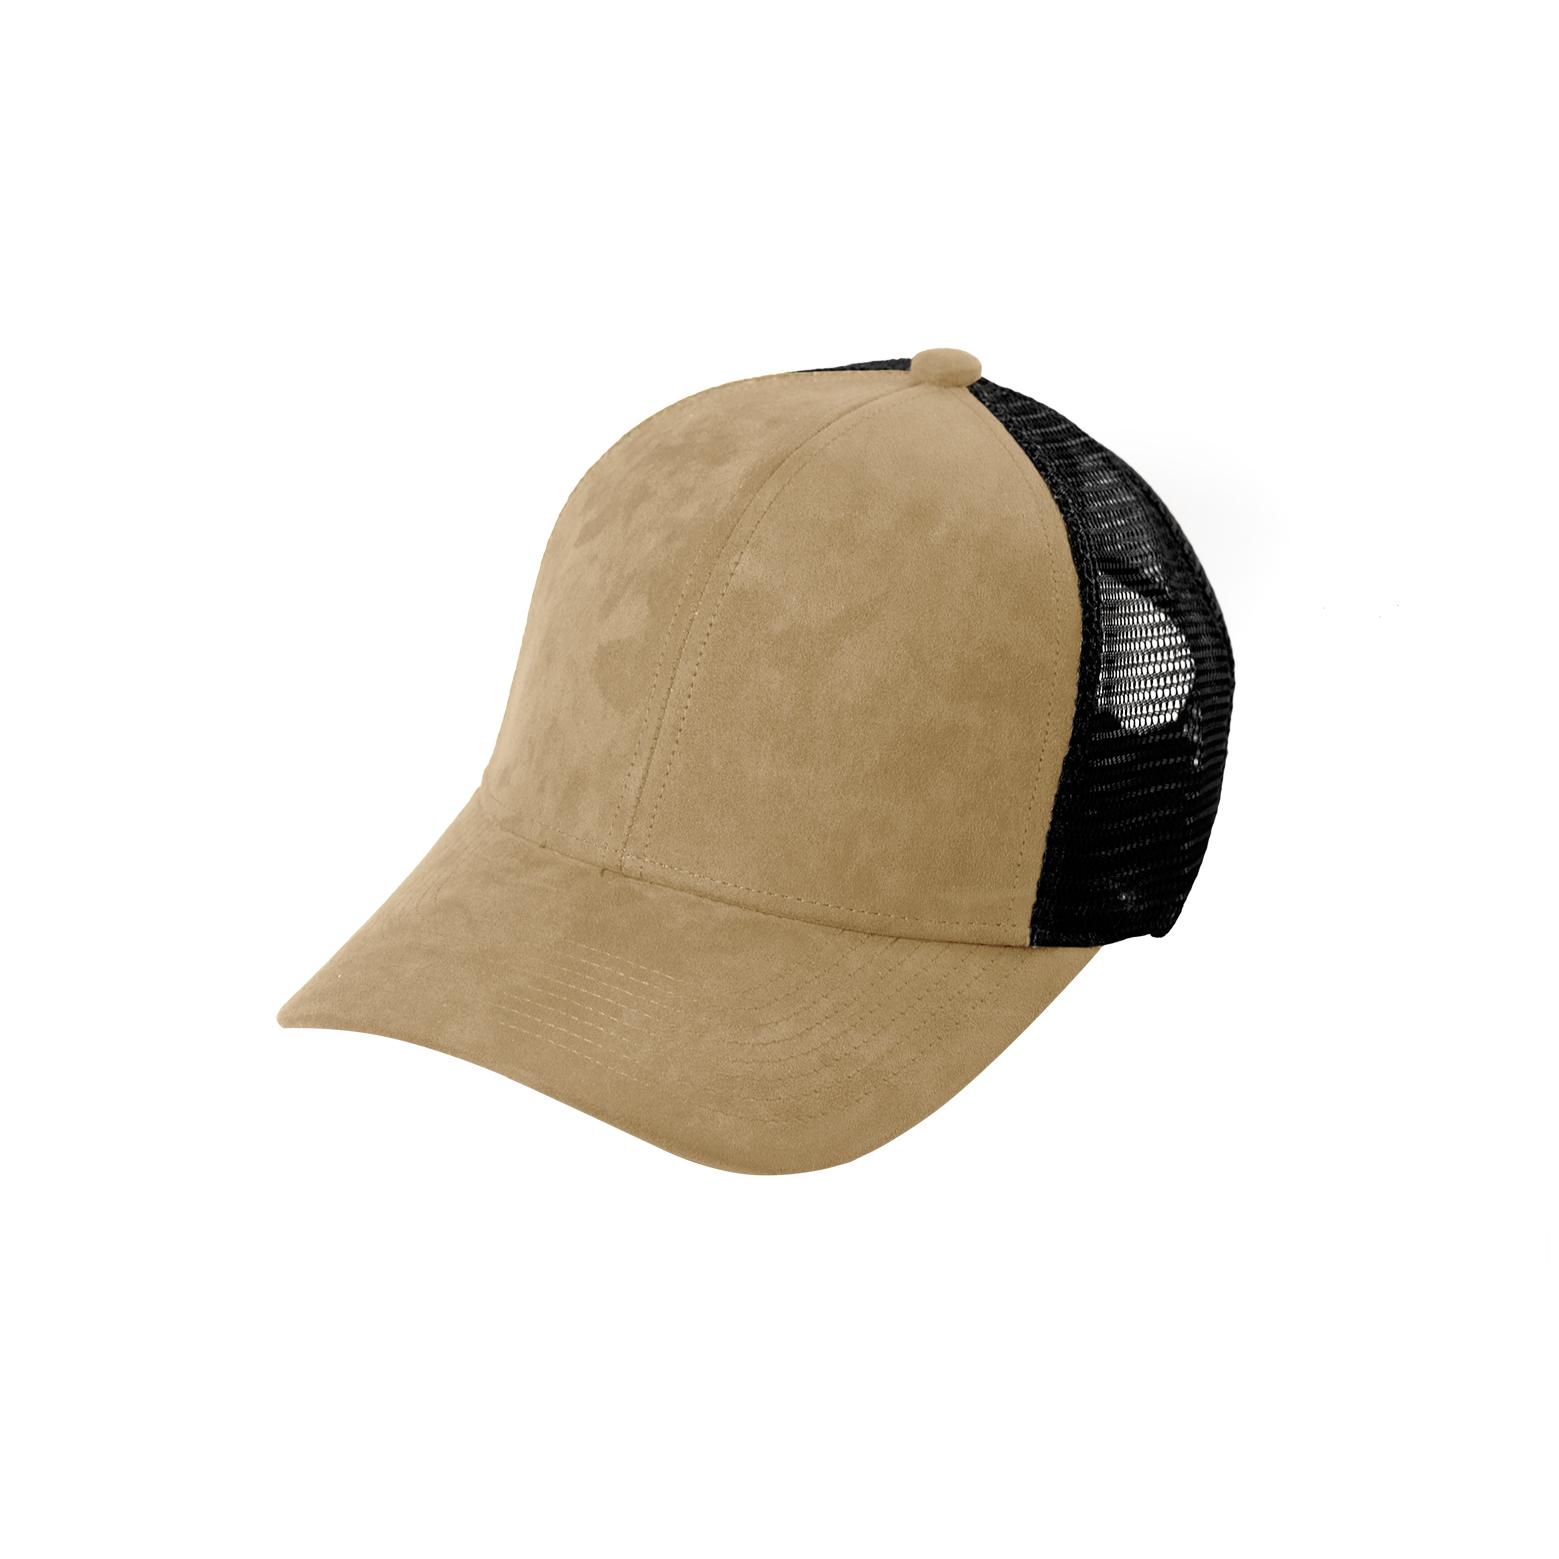 TRUCKER CAP SAND SUEDE FRONT SIDE